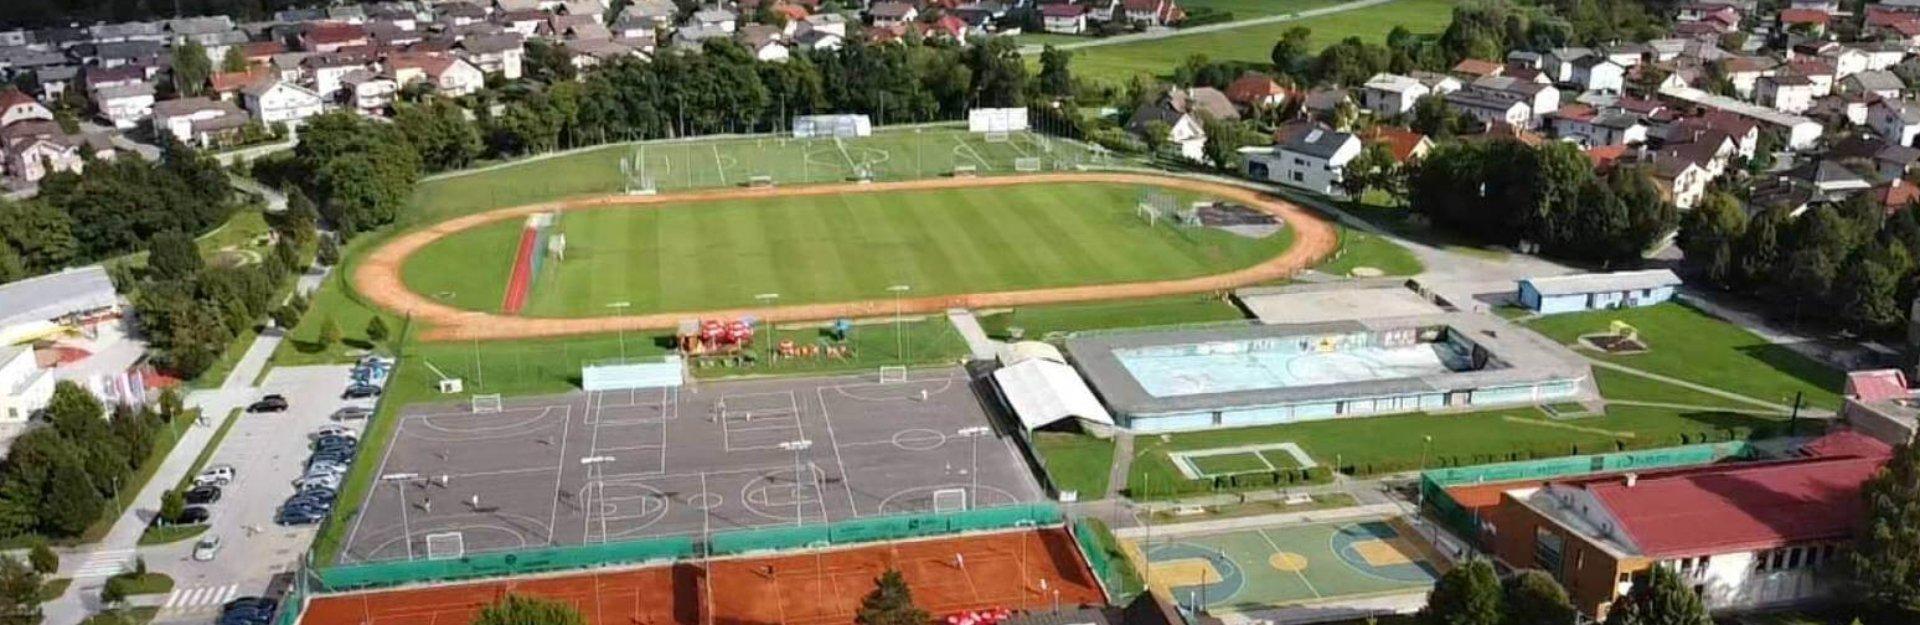 Športni park Vrhnika